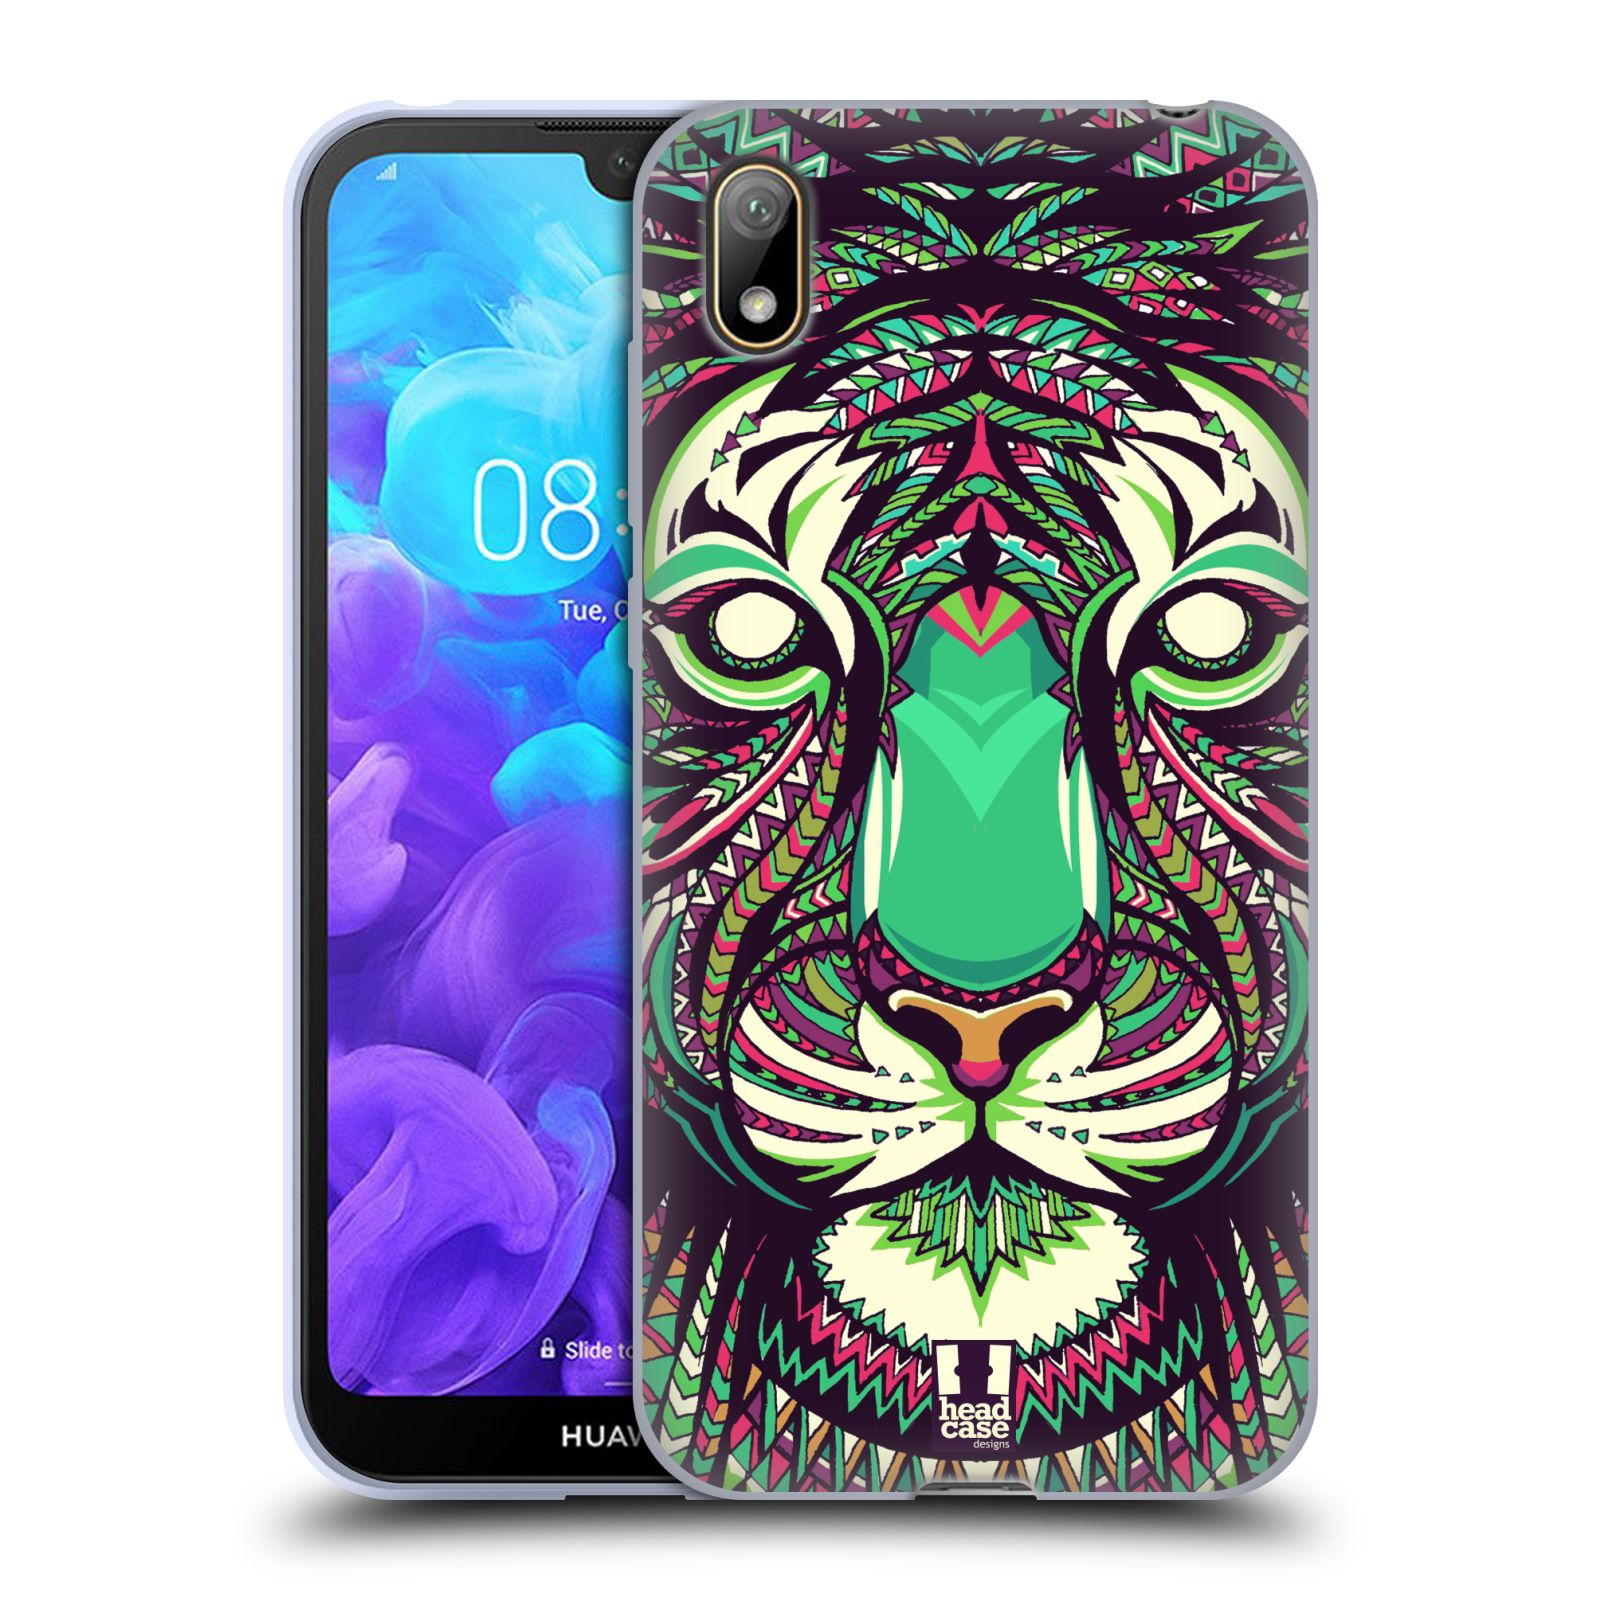 Silikonové pouzdro na mobil Huawei Y5 (2019) - Head Case - AZTEC TYGR